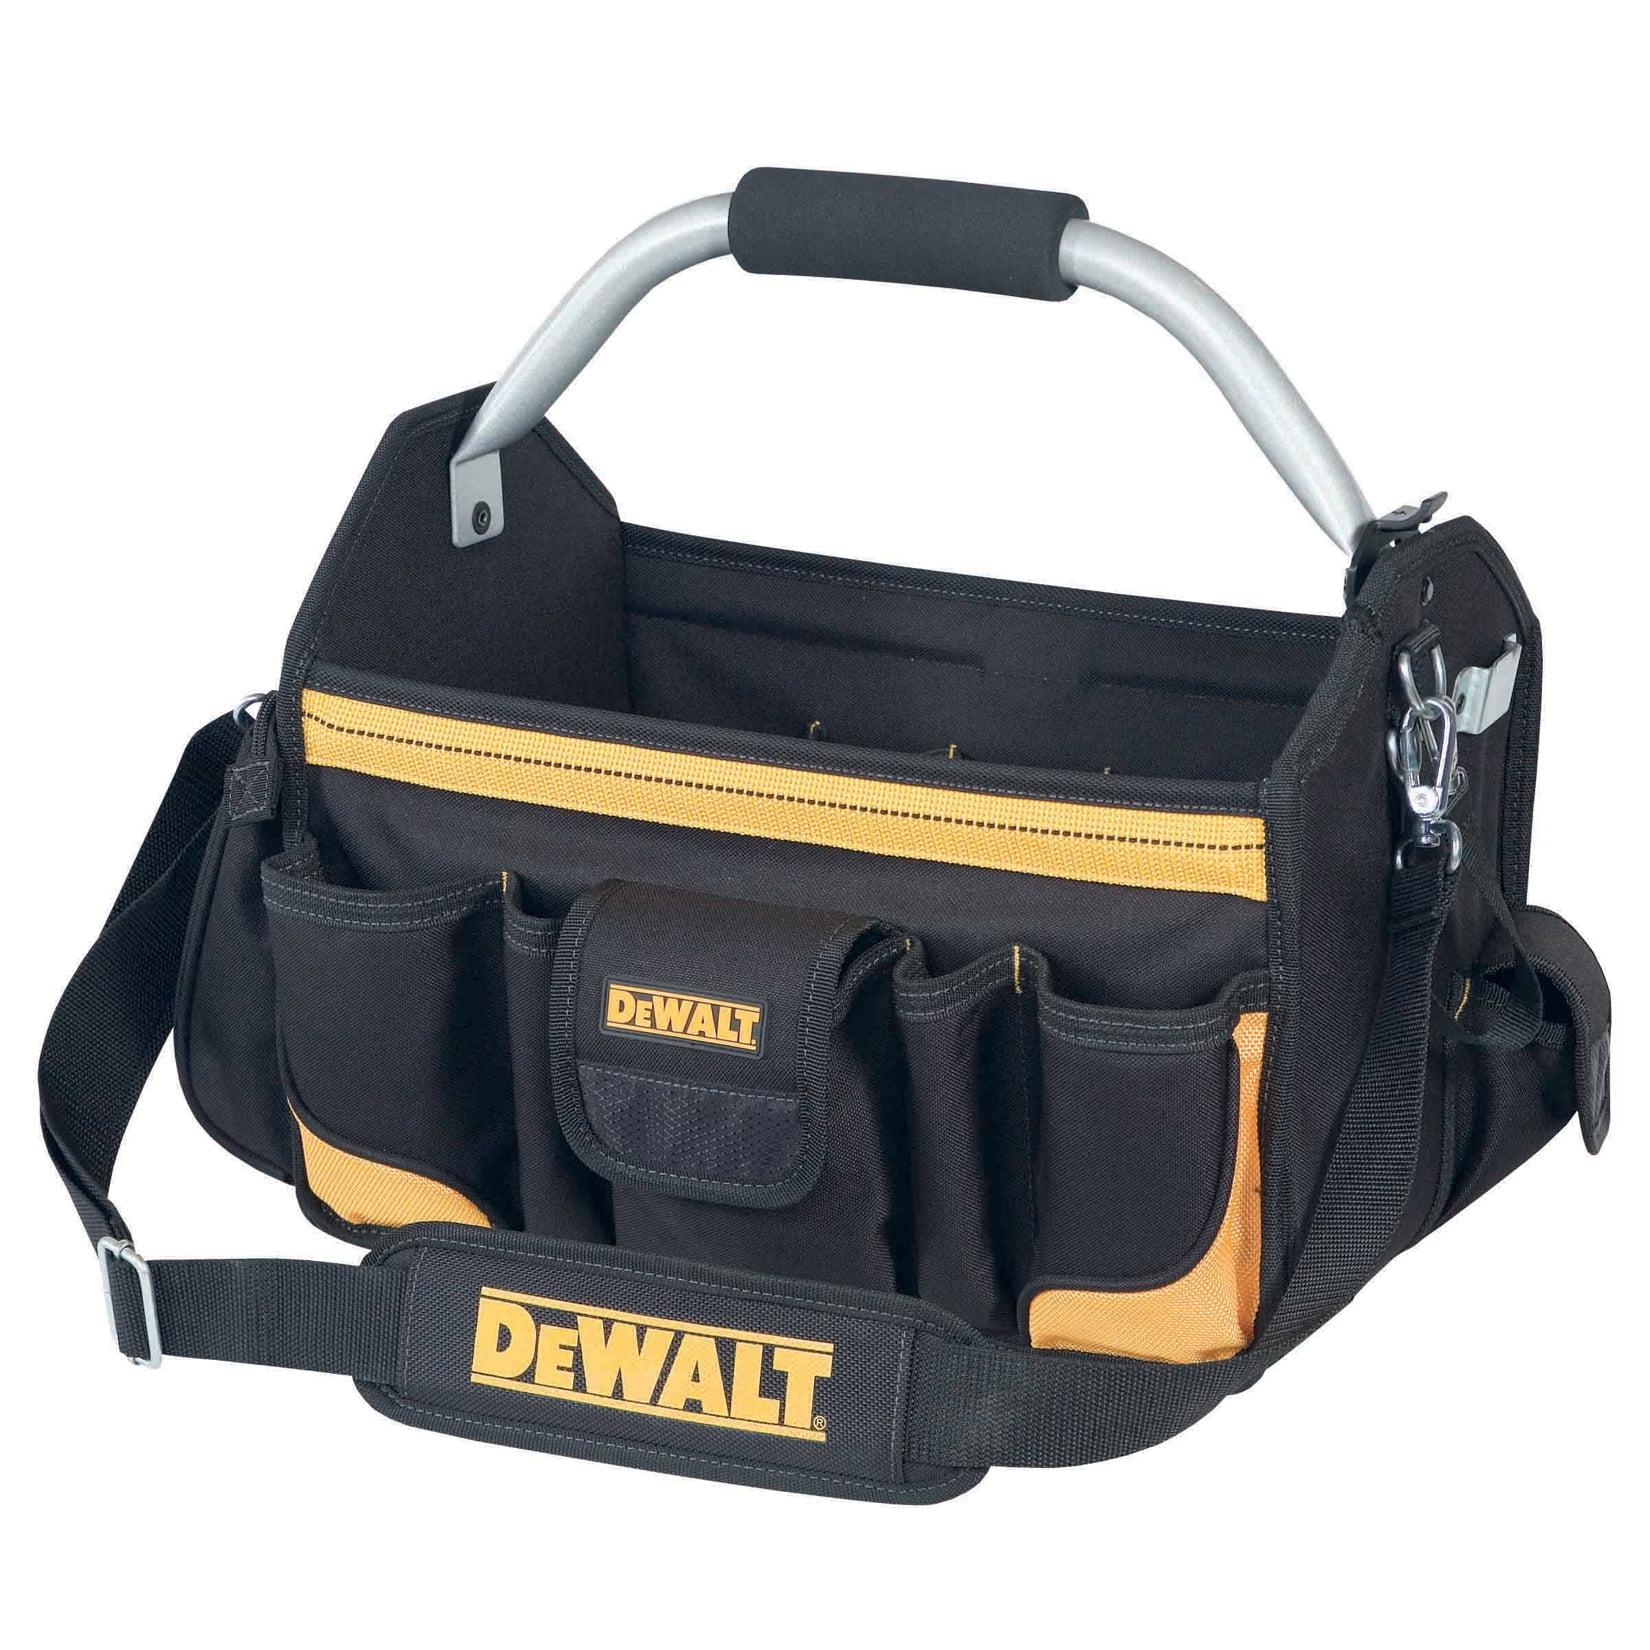 "CLC Work Gear DG5587 14"" Open Top Tool Bag by Custom Leathercraft"